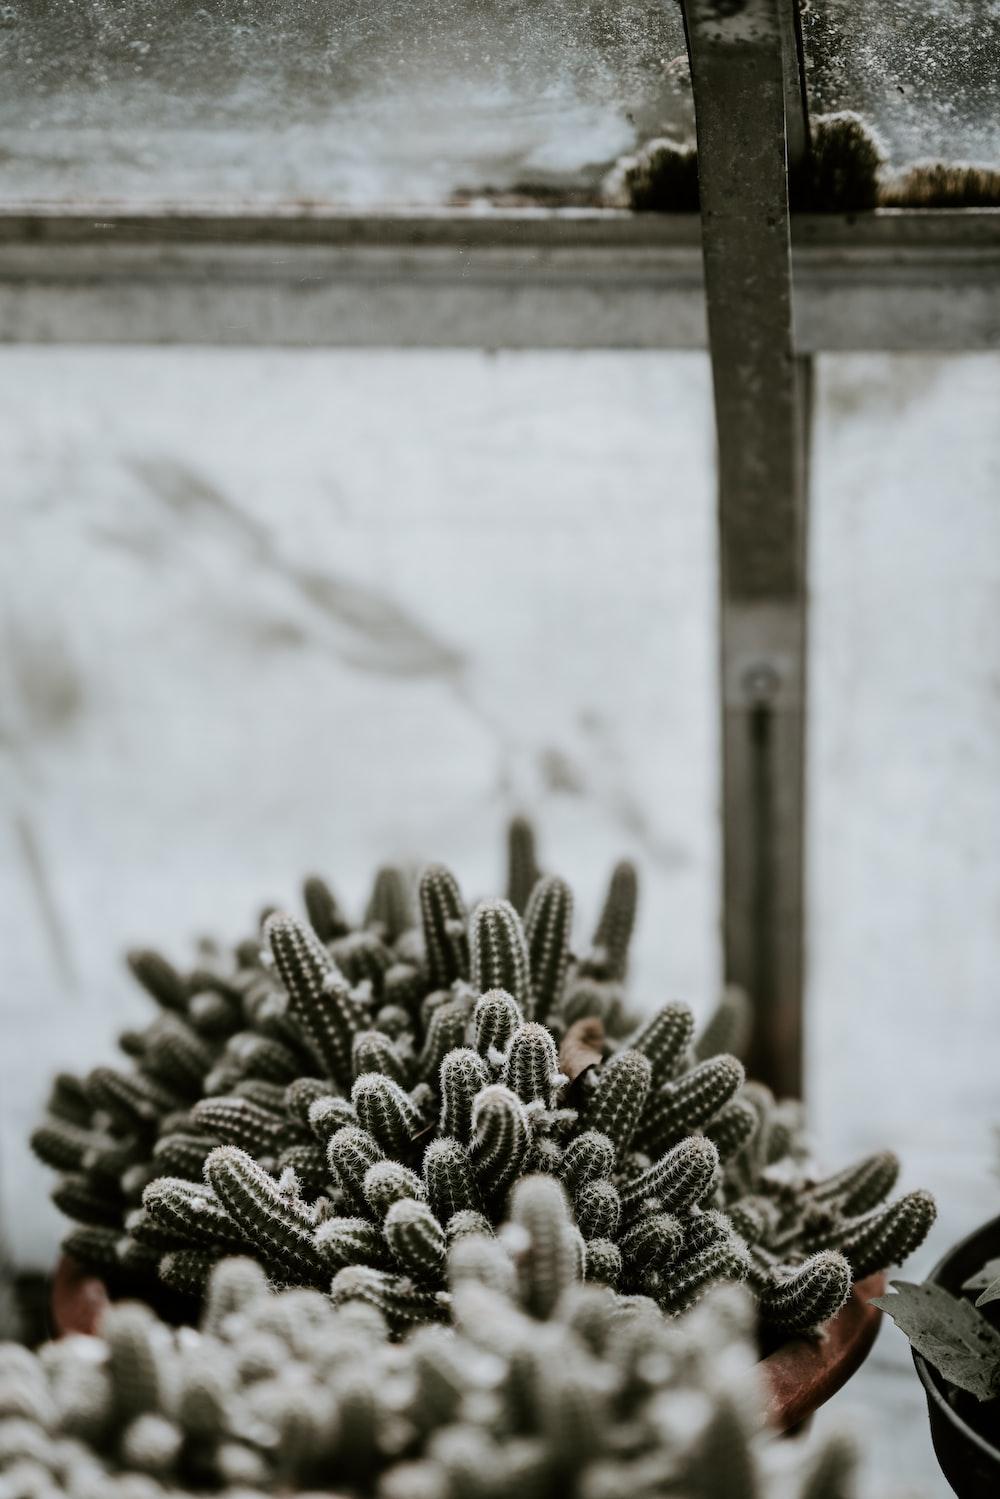 selective focus photography of cactus plants near window